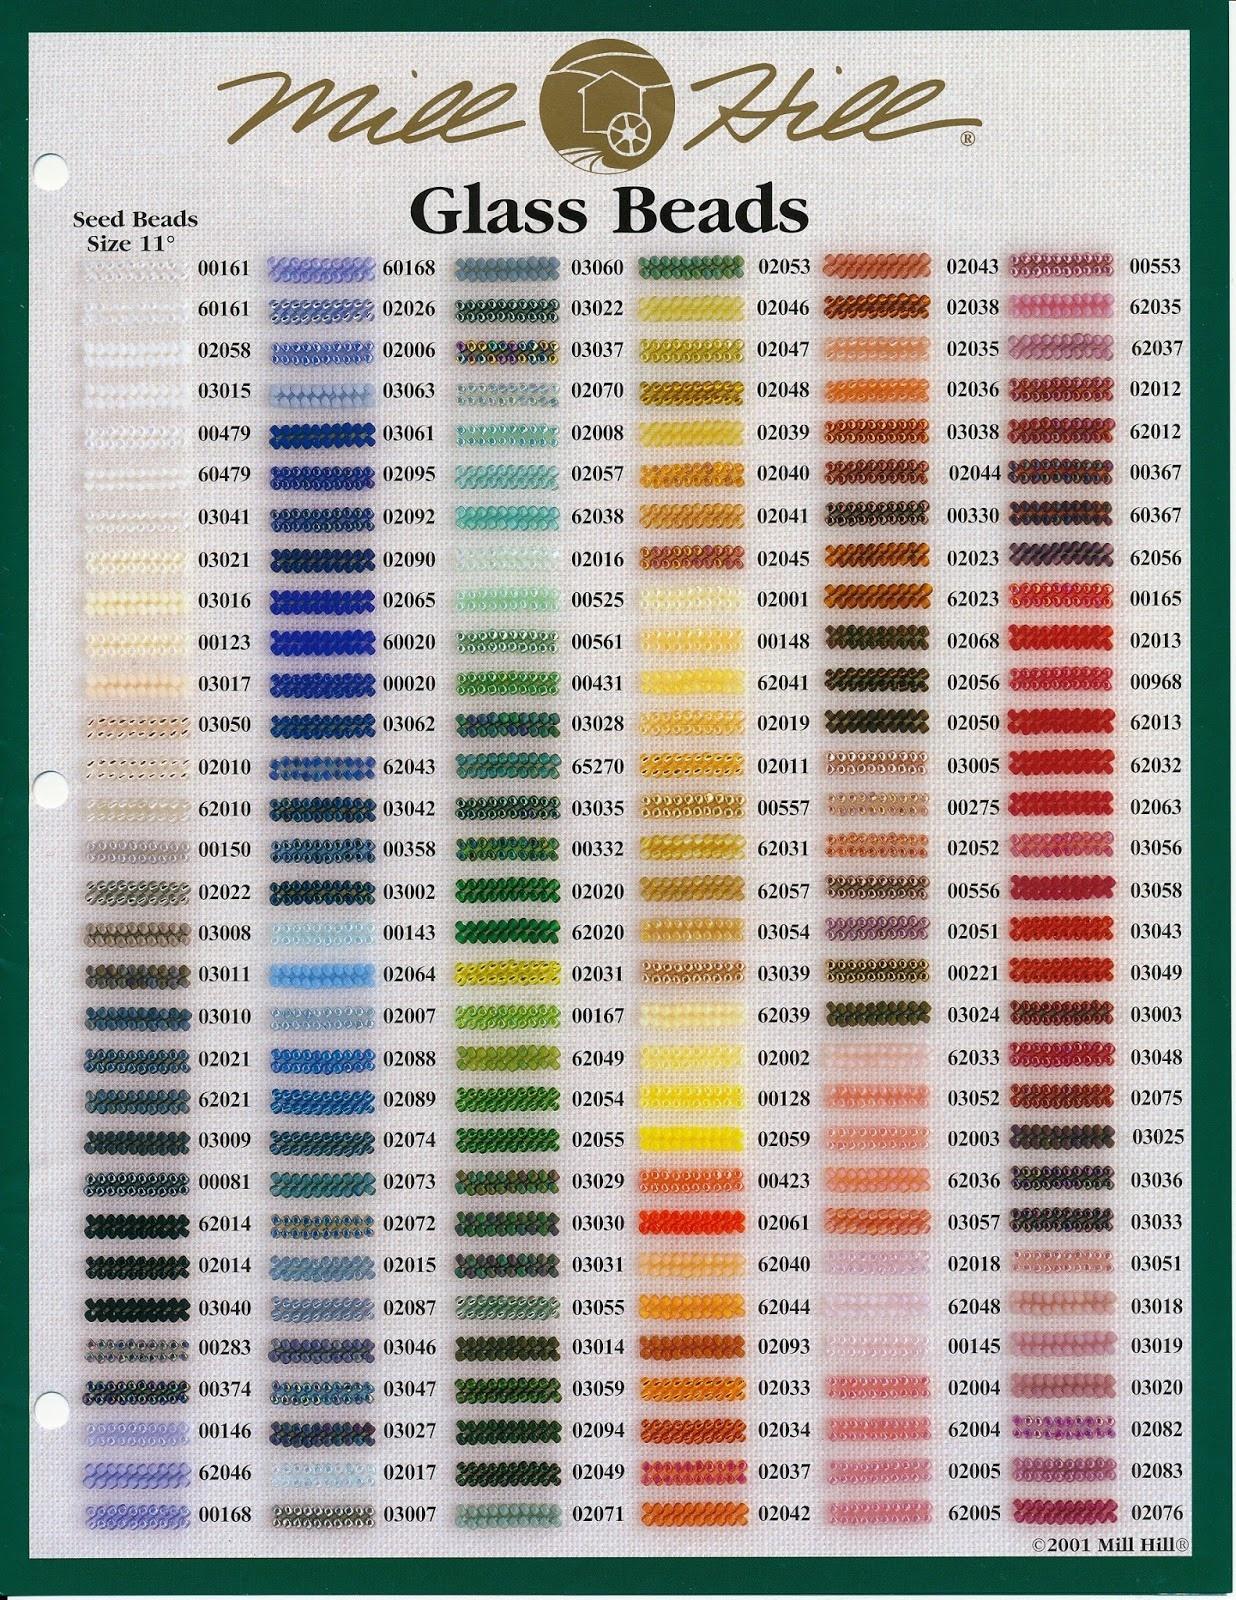 Mill Hill PETITE GLASS BEADS - MILL HILL